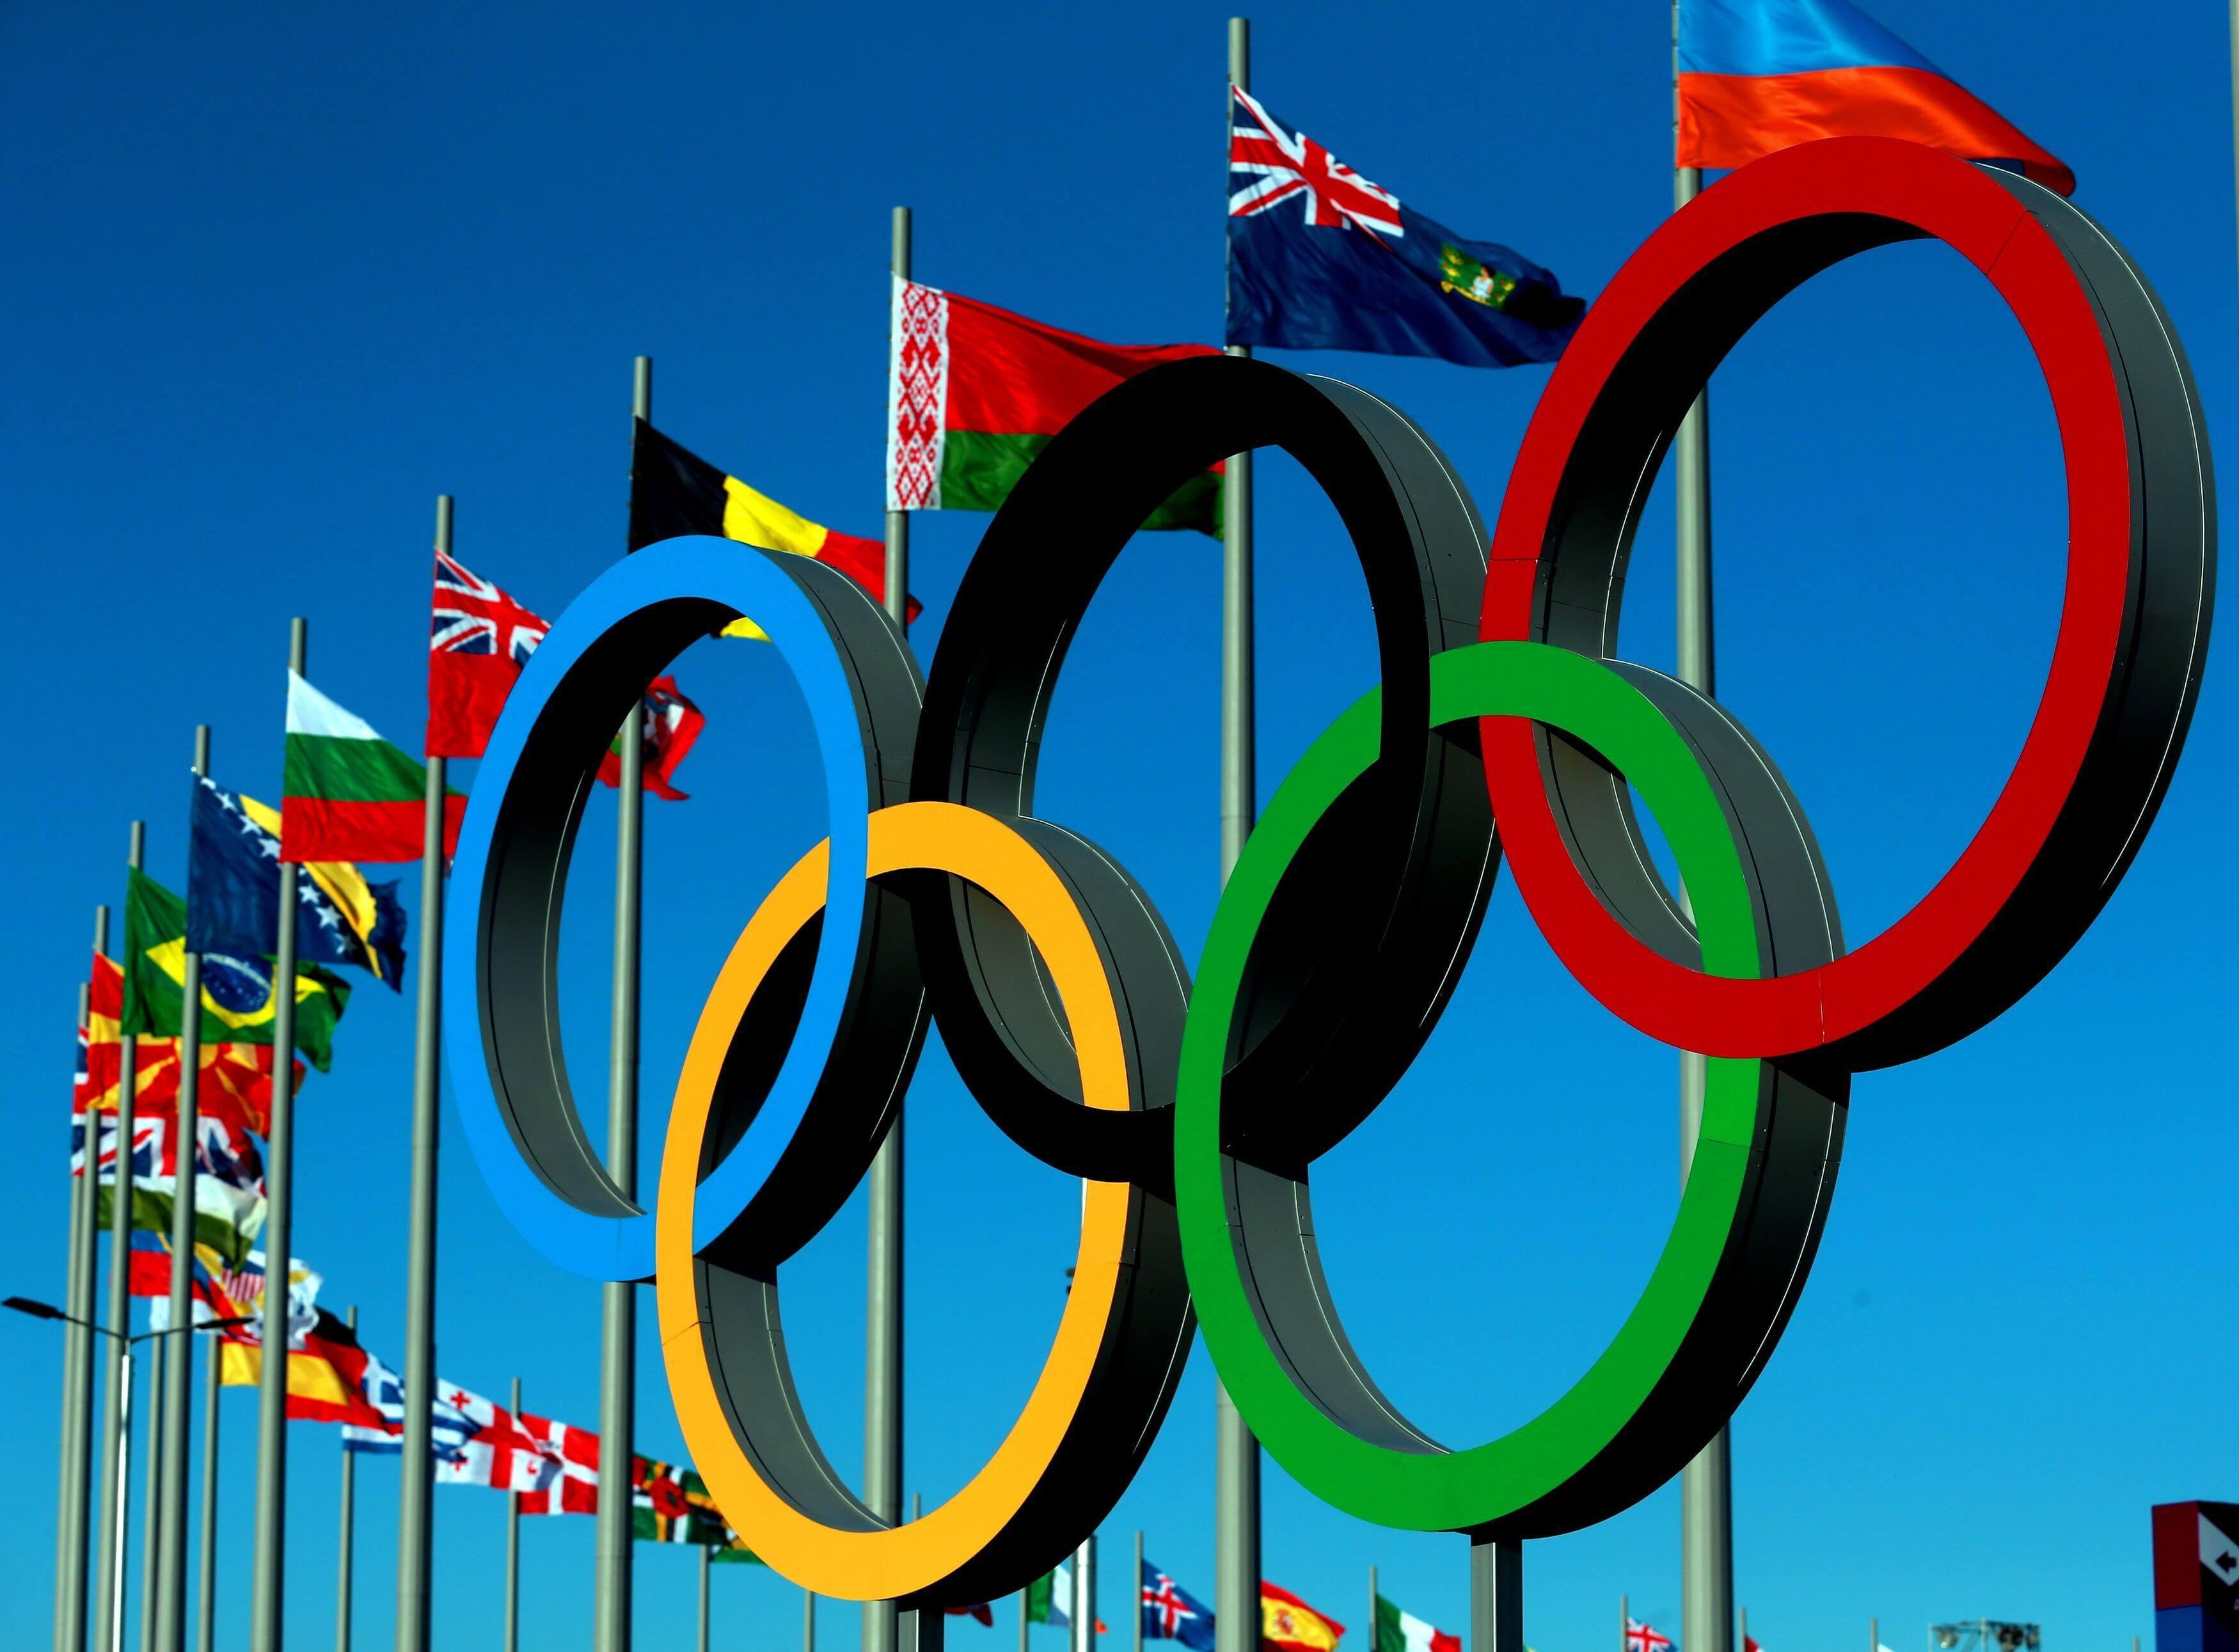 atletism,baschet,box,canotaj,ciclism,fotbal,gimnastica,inot,lupte,scrima,tir sportiv,Jocurile Olimpice,coronavirus,tokyo